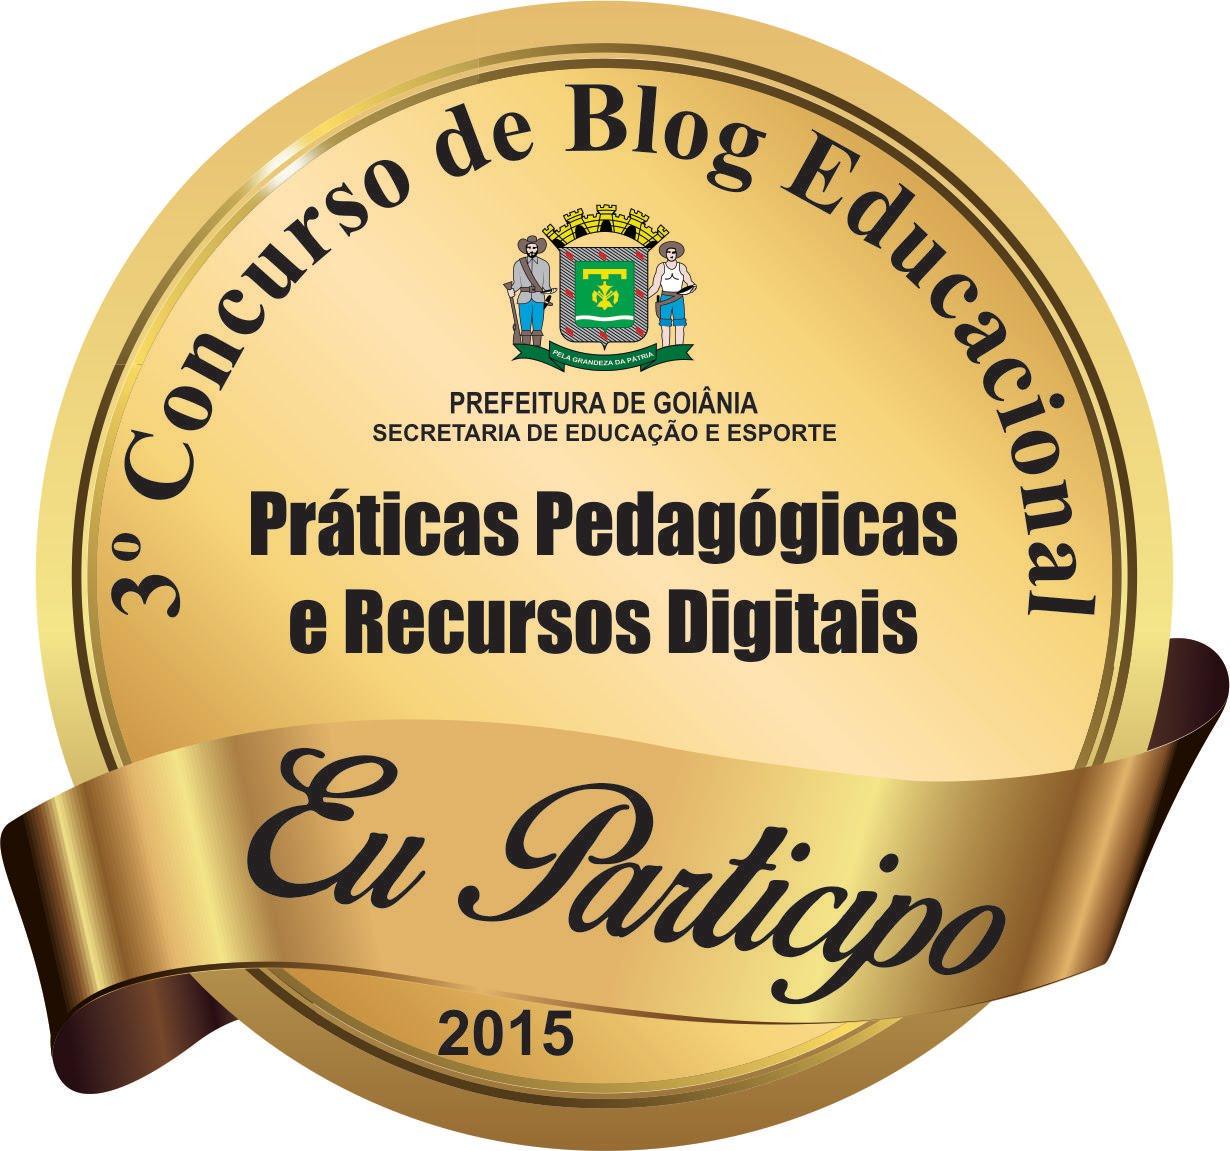 3º Concurso de Blog Educacional